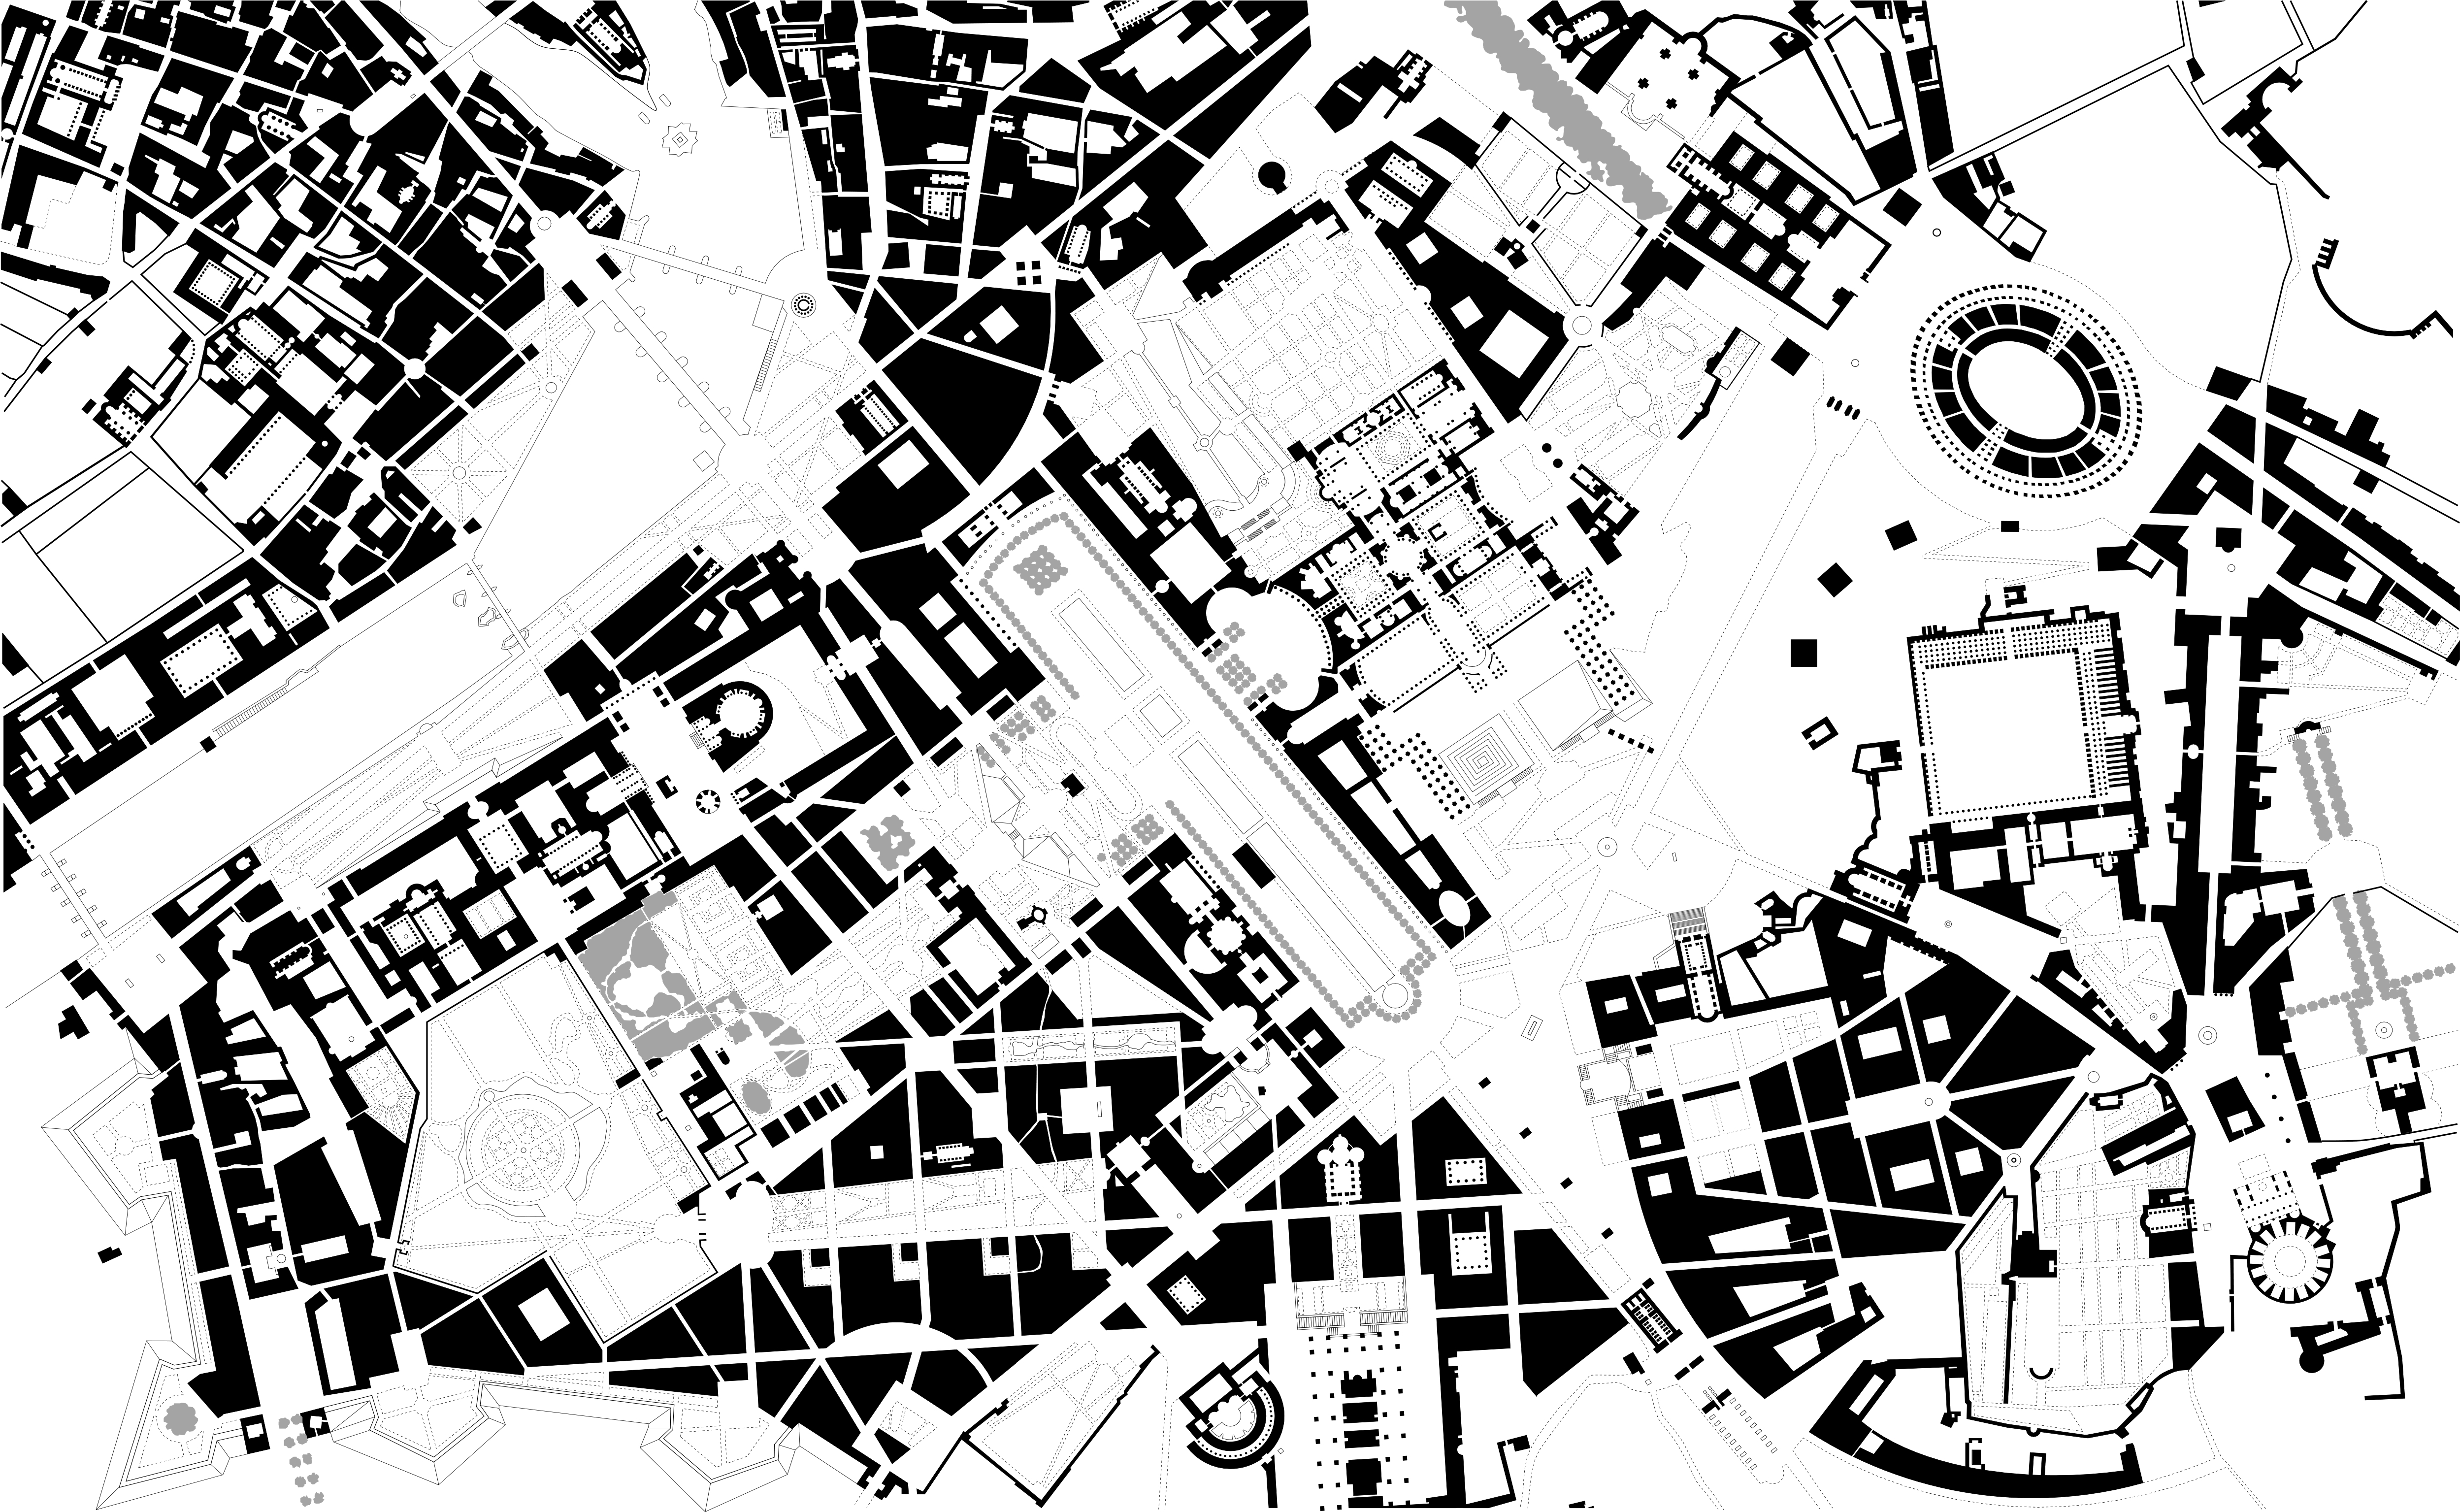 the plan game the origins of collage city looking cities 1970s San Diego Skyline roma interrota original rowe02